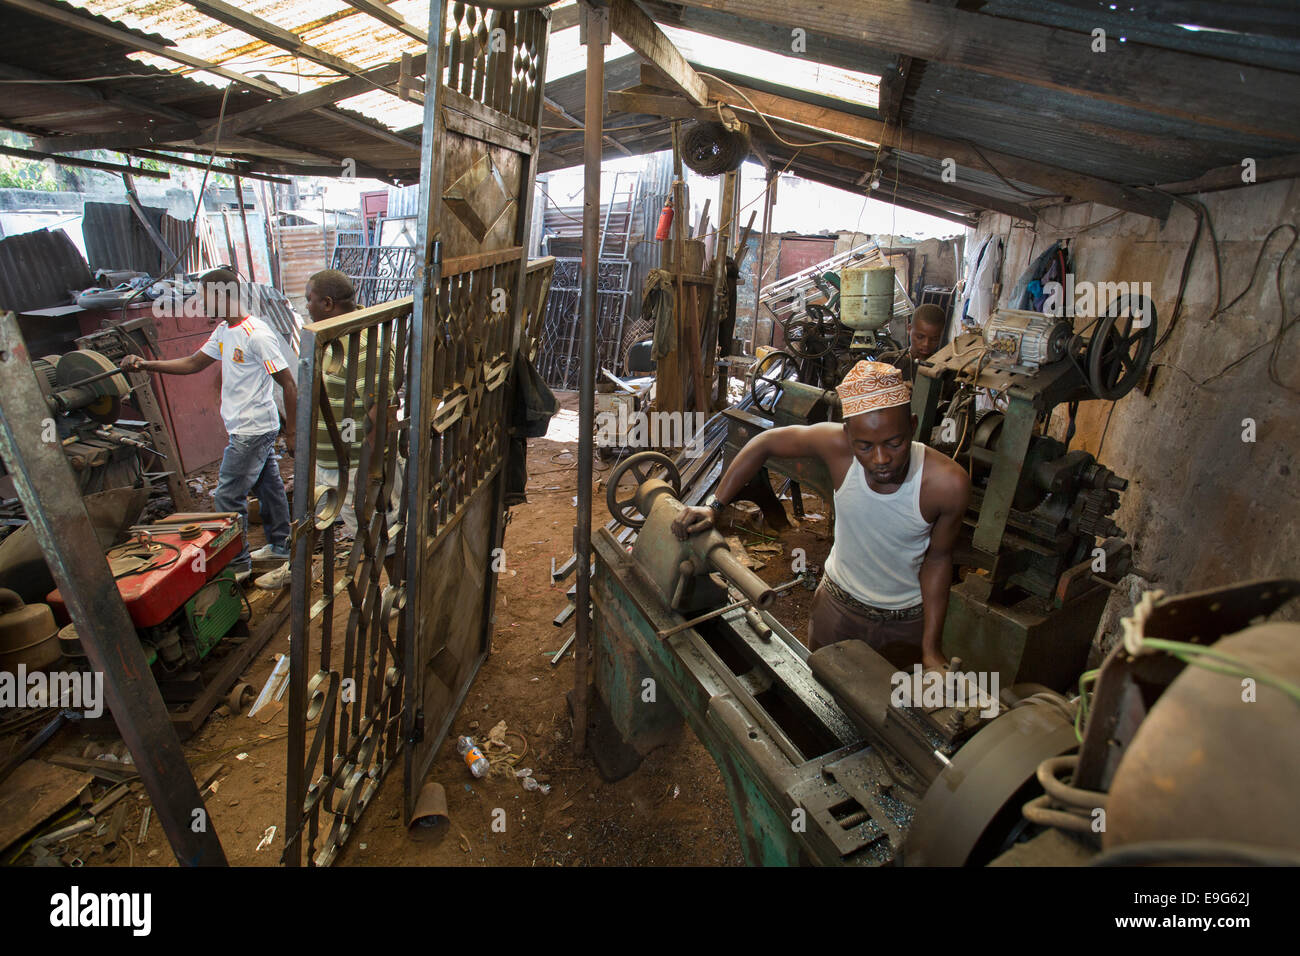 Machinery at a metal workshop in Dar es Salaam, Tanzania, East Africa. Stock Photo